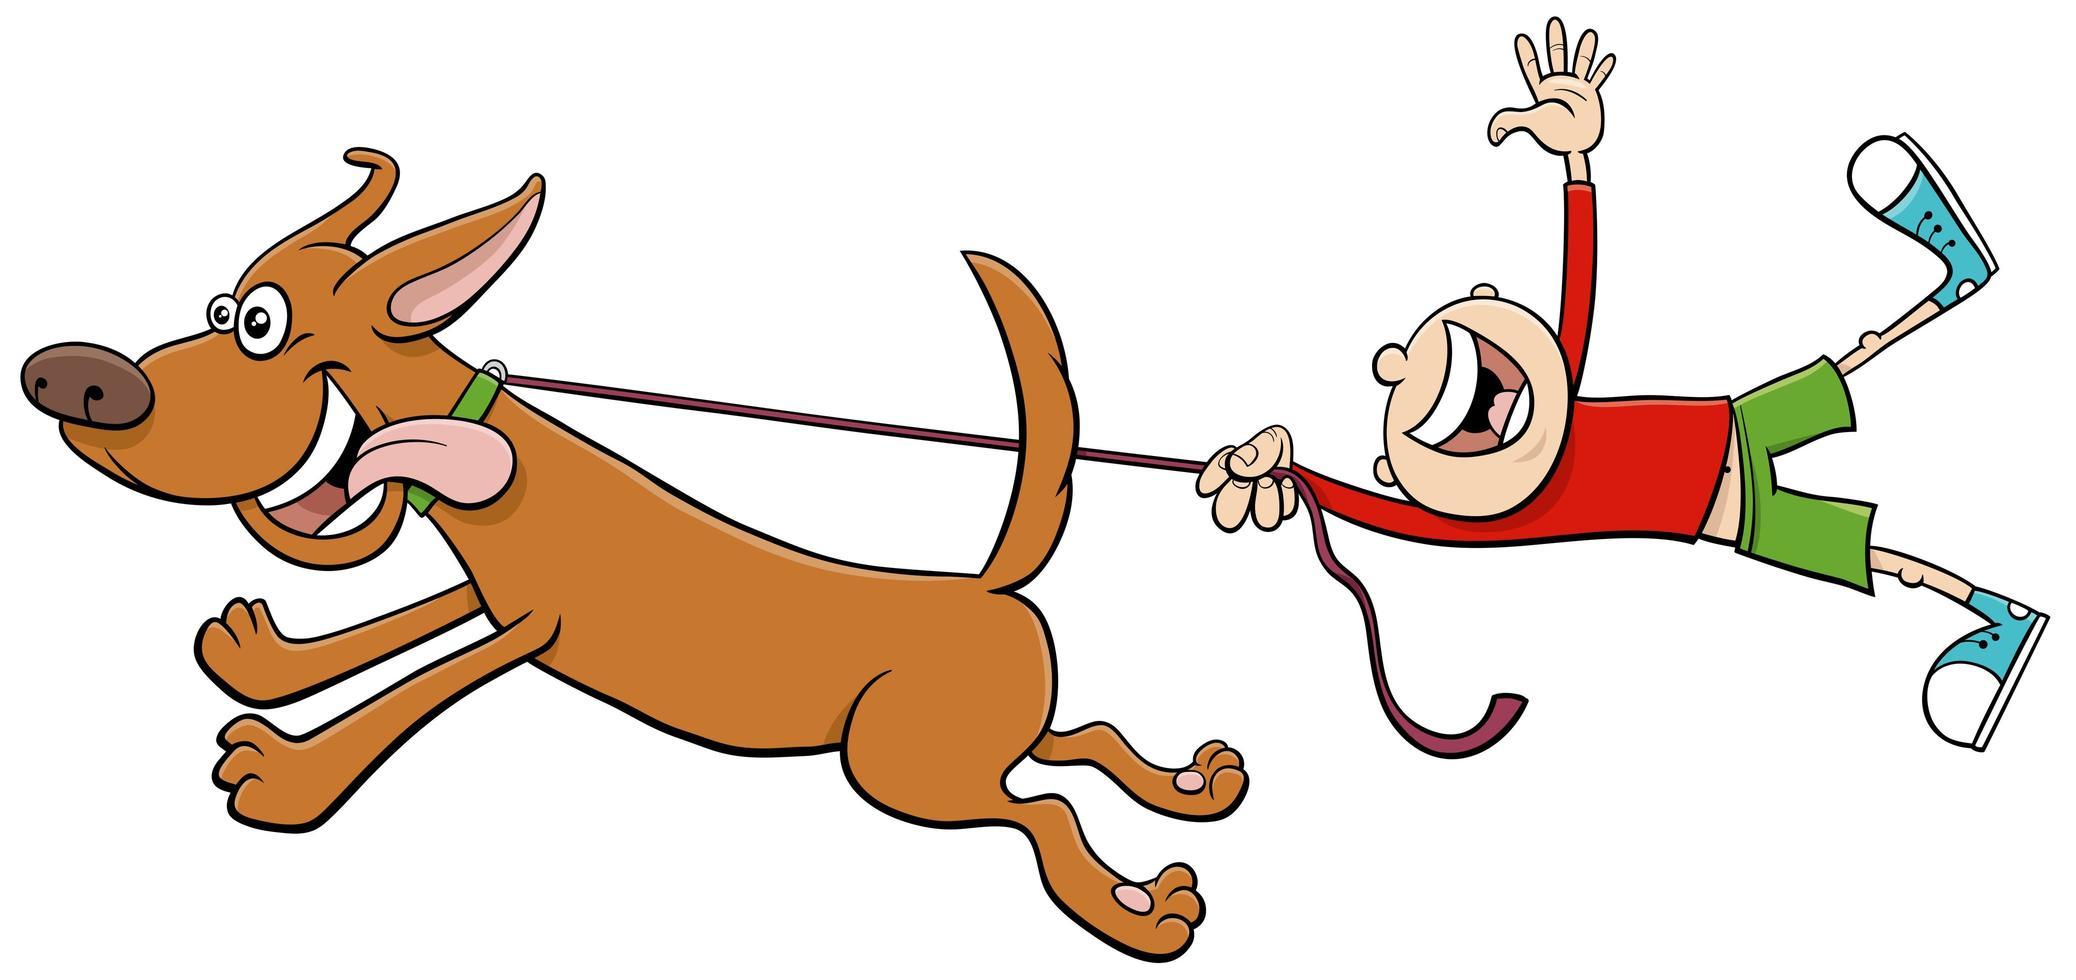 perro, tirar, niño, con, correa, caricatura vector